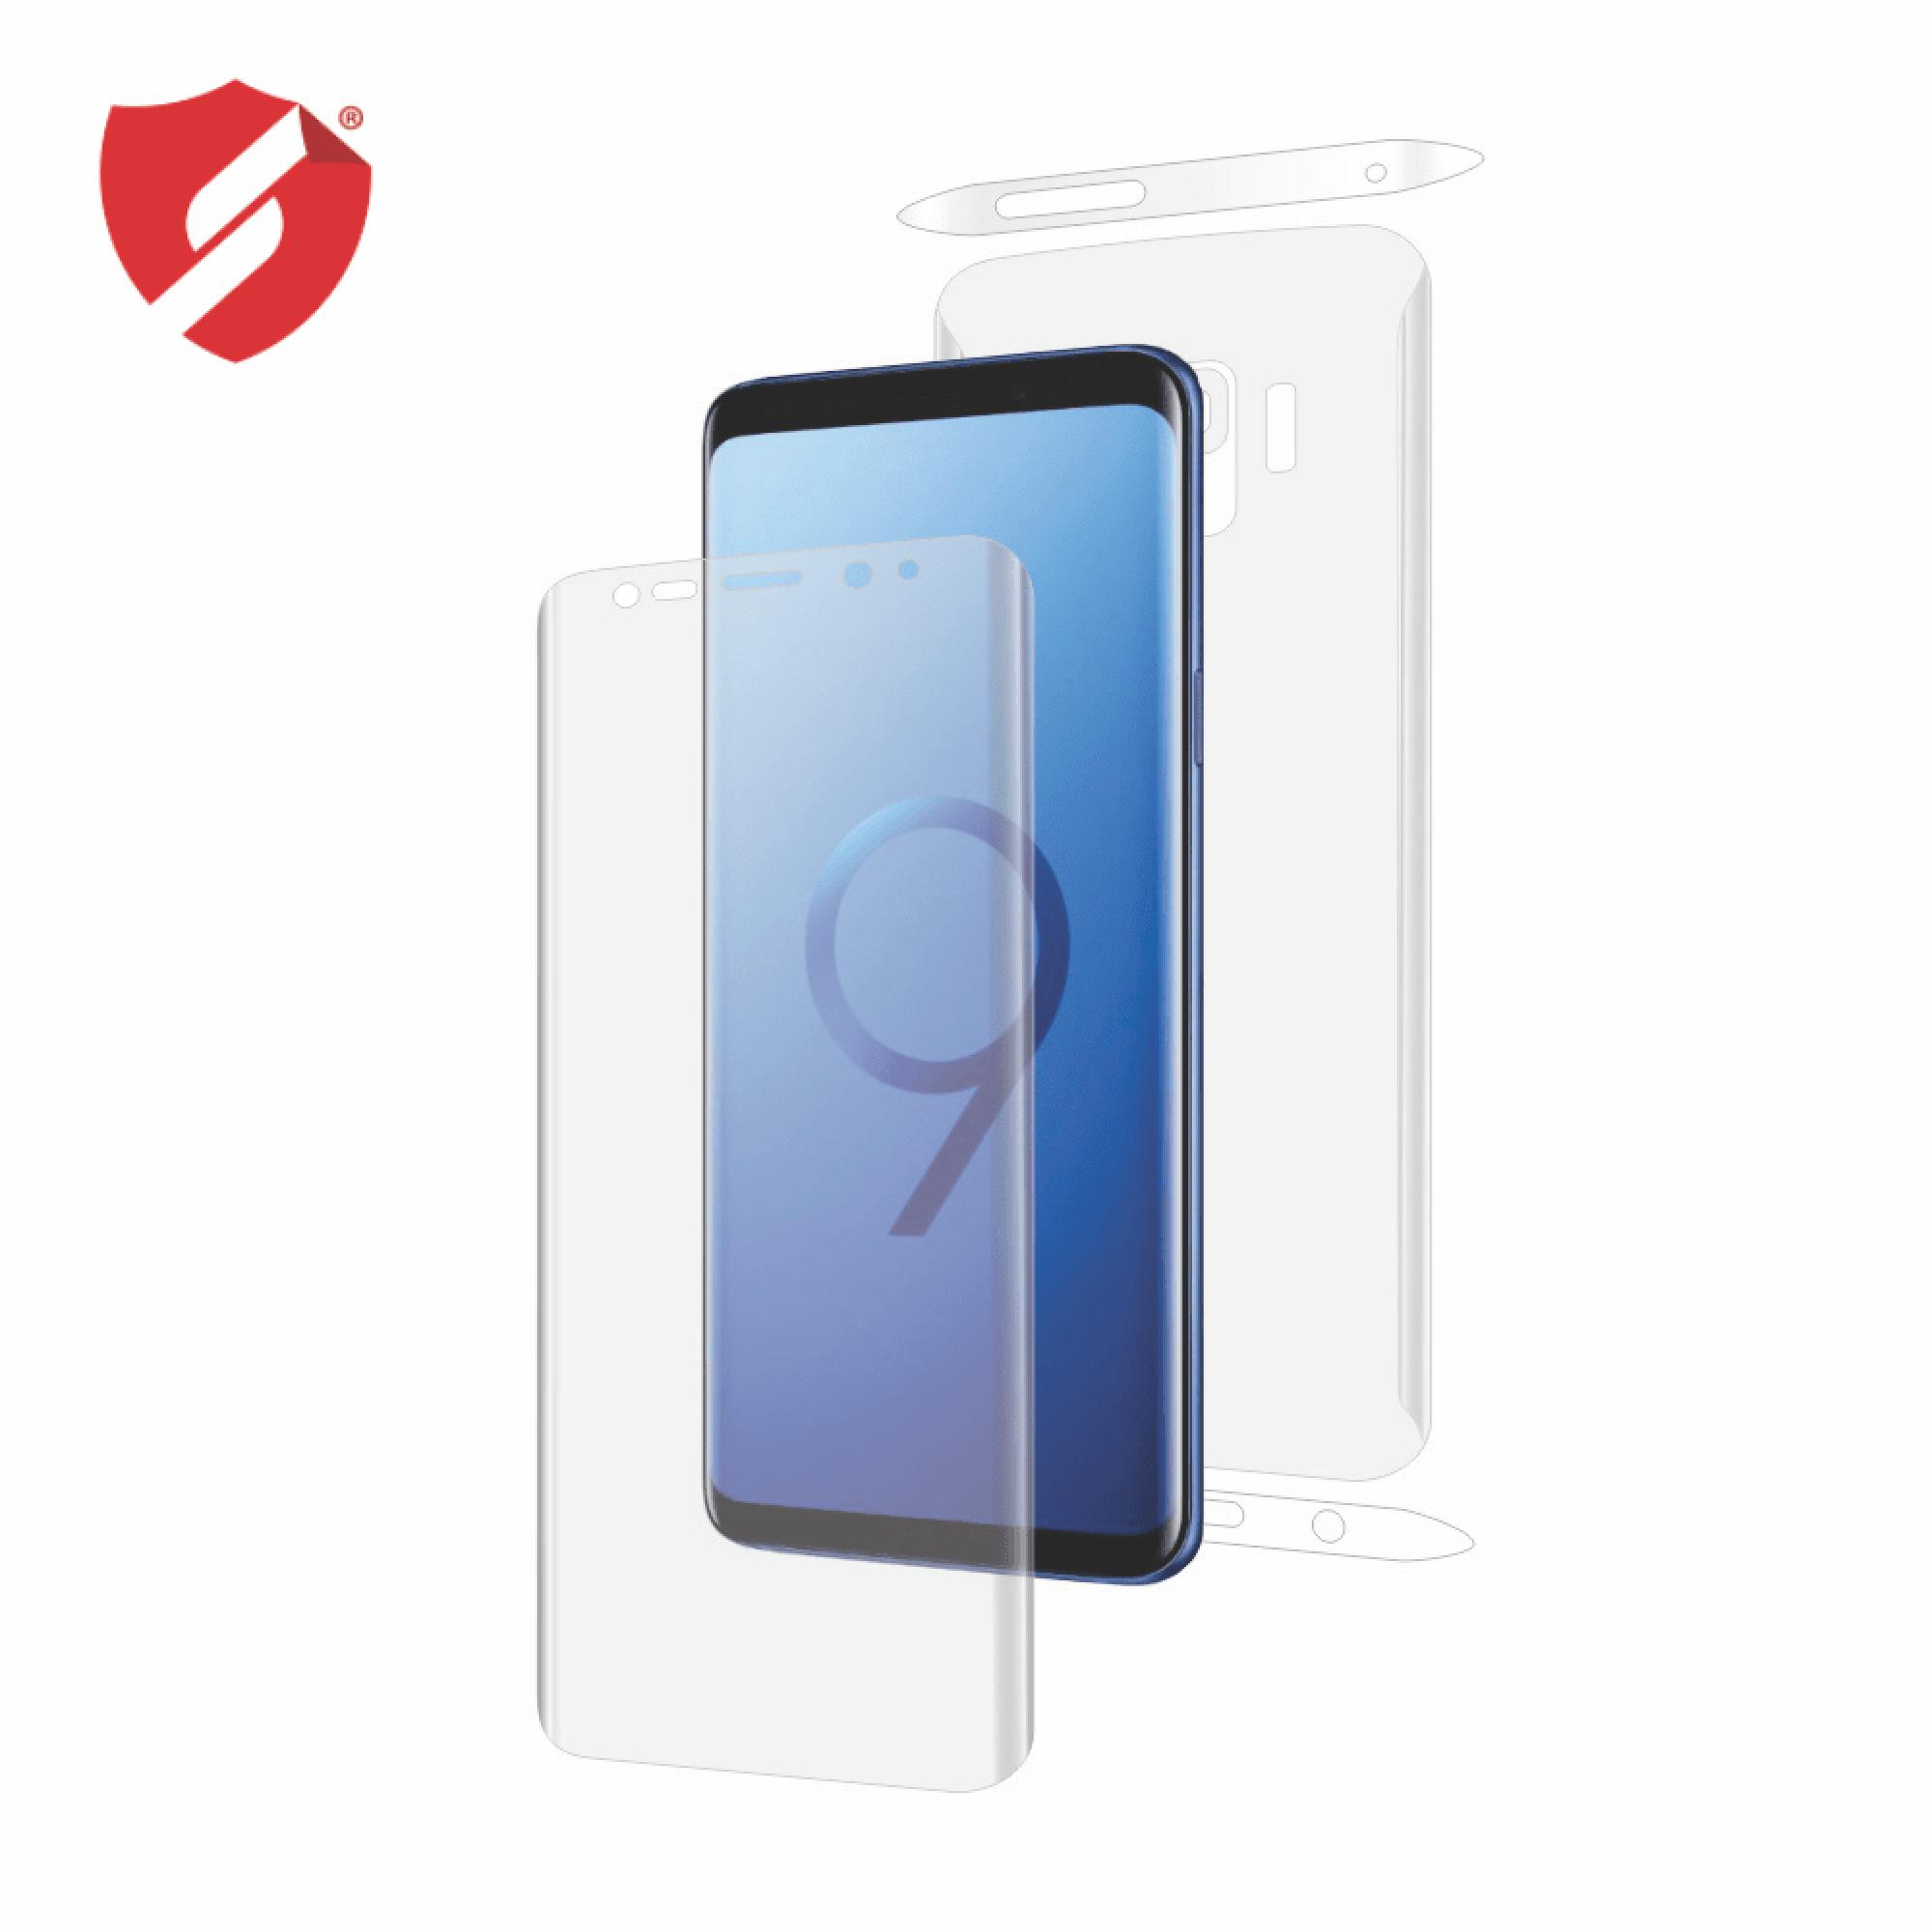 Folie de protectie Smart Protection Samsung Galaxy S9 compatibila cu carcasa Spigen - fullbody - display + spate + laterale imagine